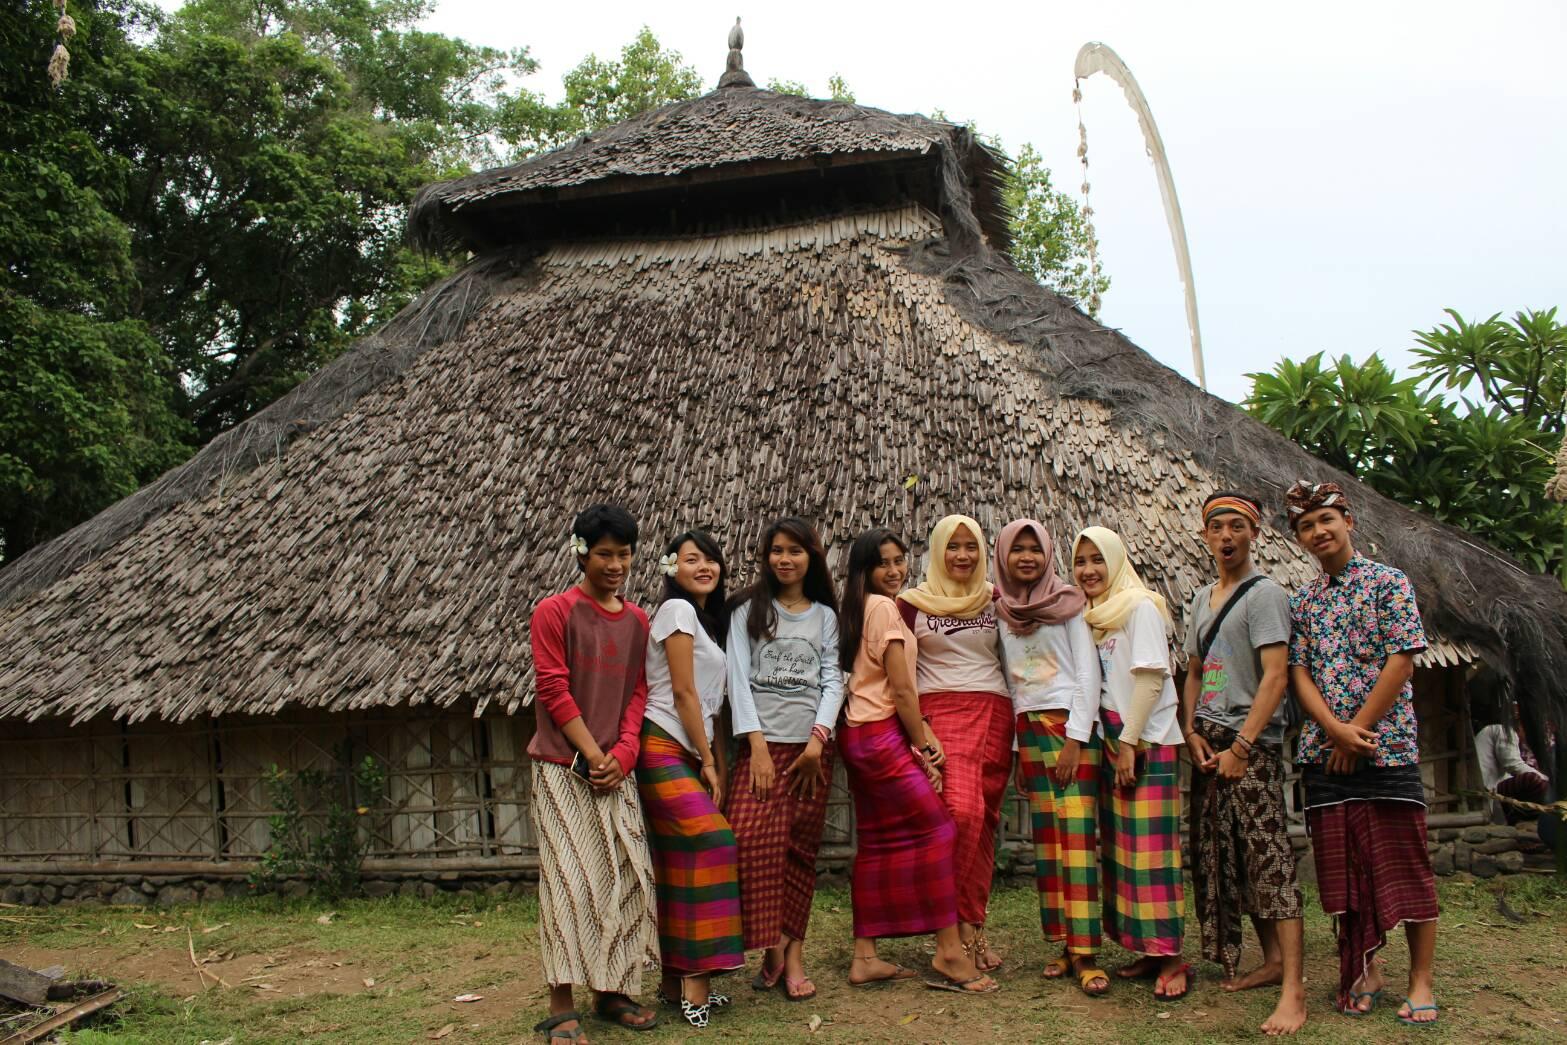 Mesjid Kuno Bayan Lombok Selaparang Perkasa Tours Travel Salah Satu